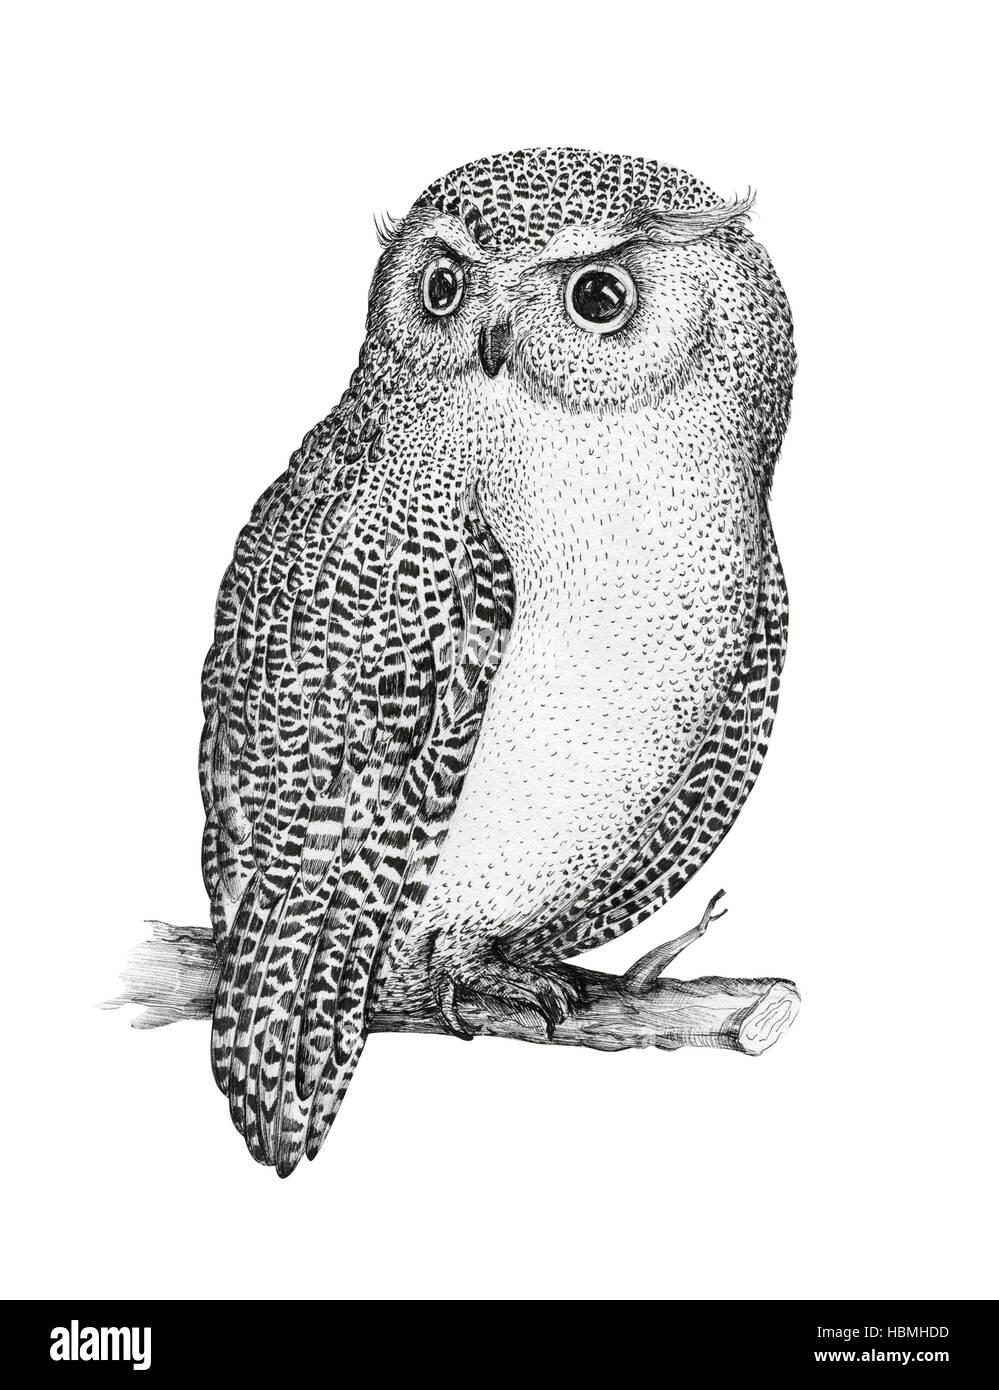 bb64023de28c7 Hand drawn isolated black white illustration owl fly bird. Trib ...